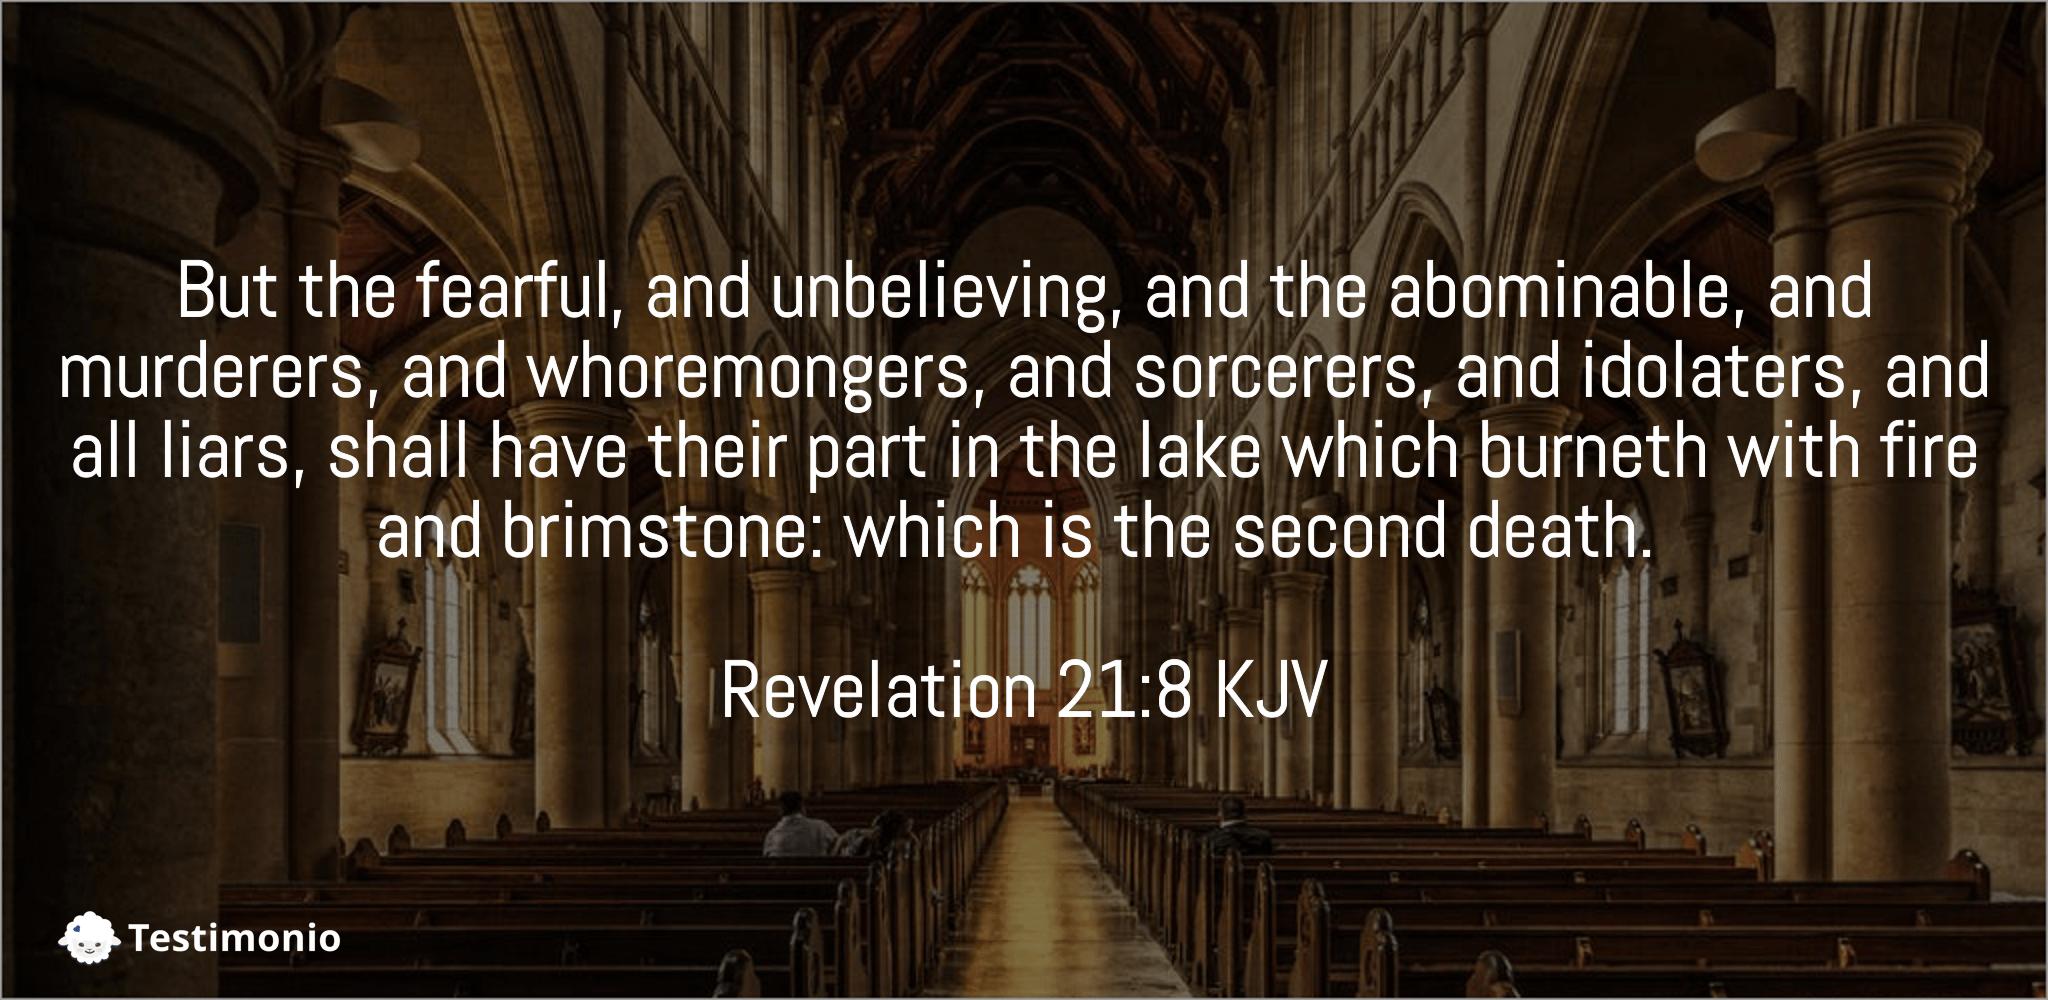 Revelation 21:8